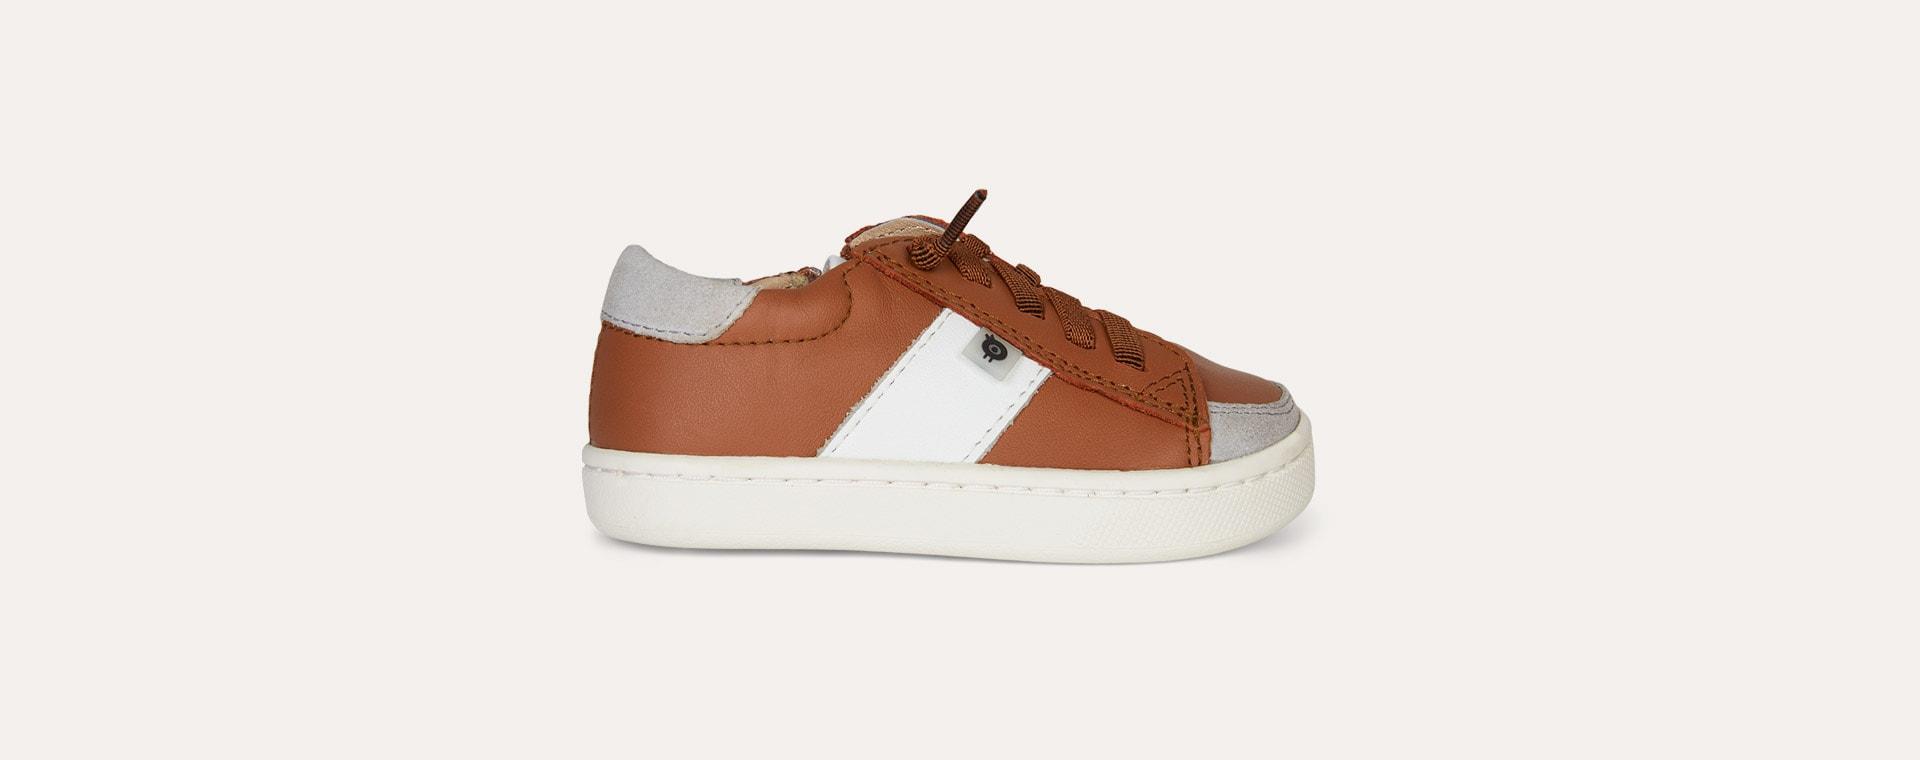 Tan old soles High Street Shoe